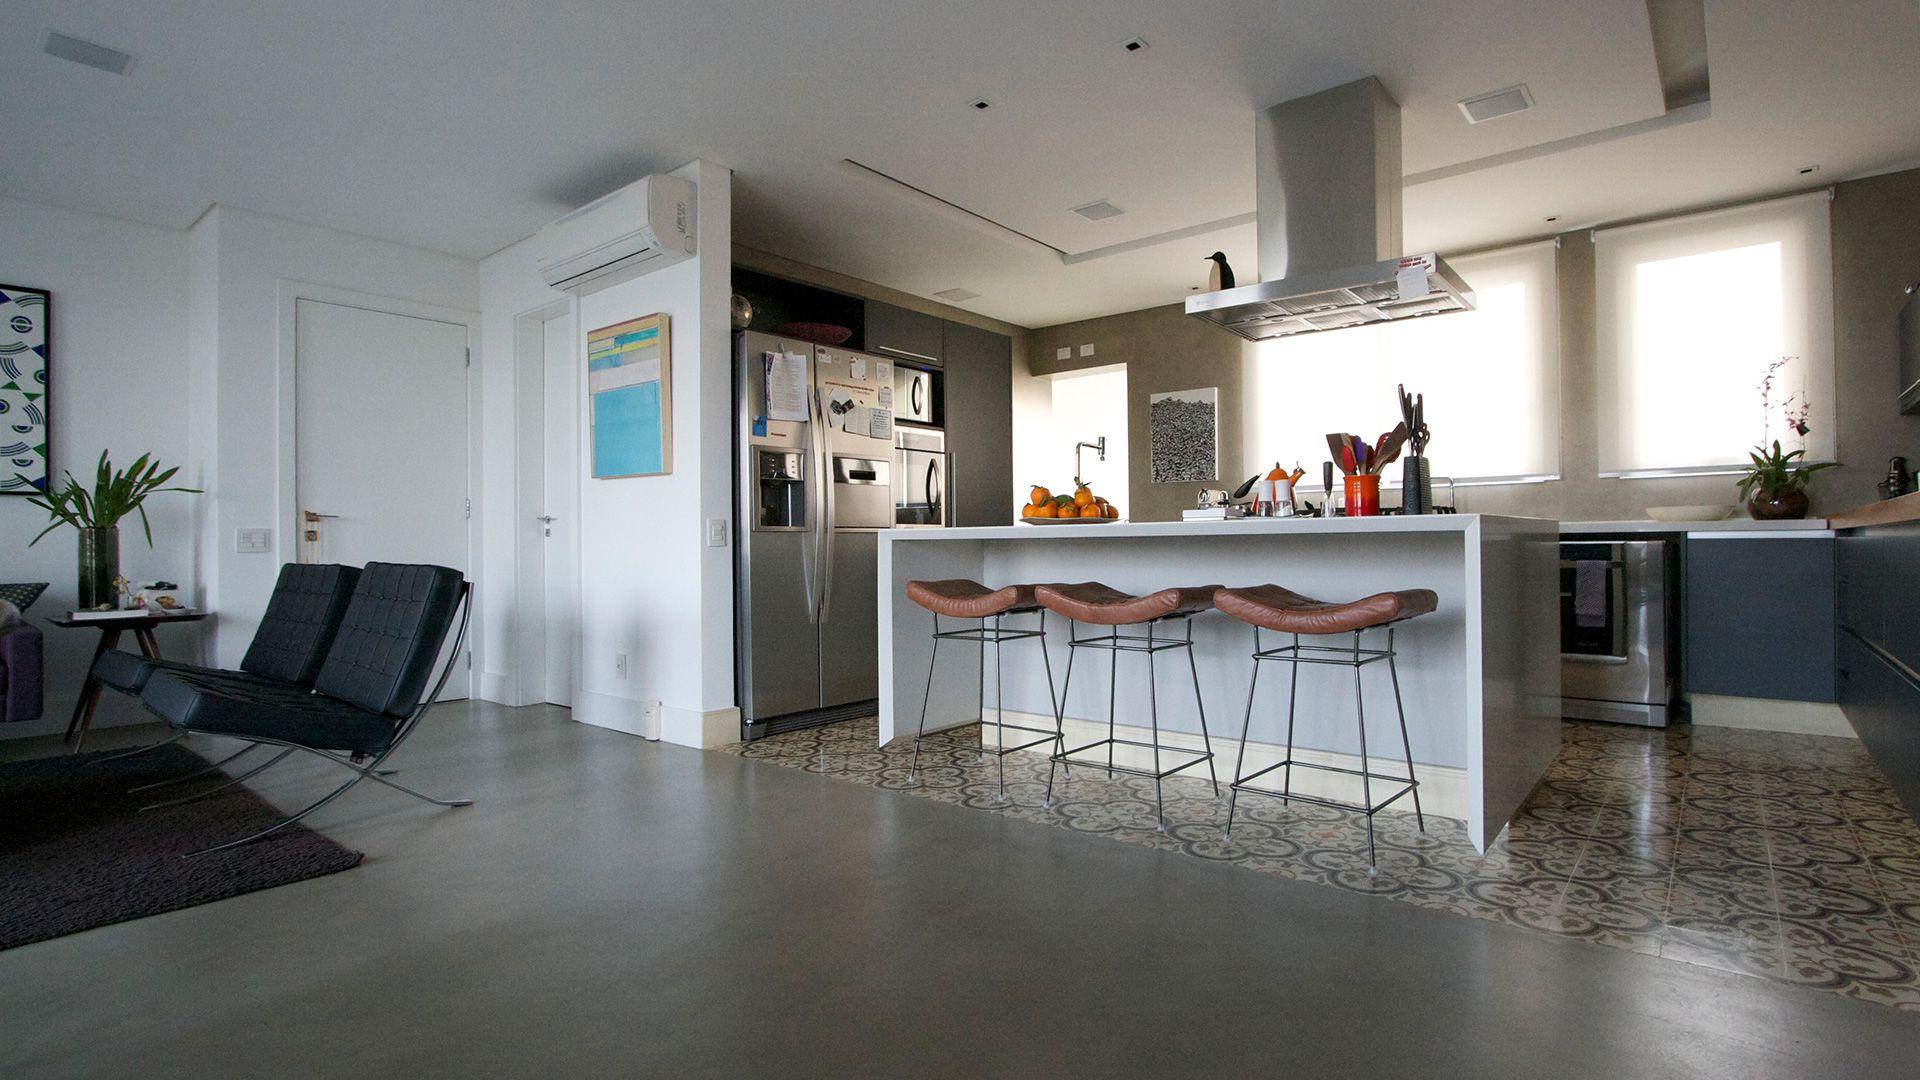 apto-analia-franco-foto-sala-de-estar-e-cozinha-01